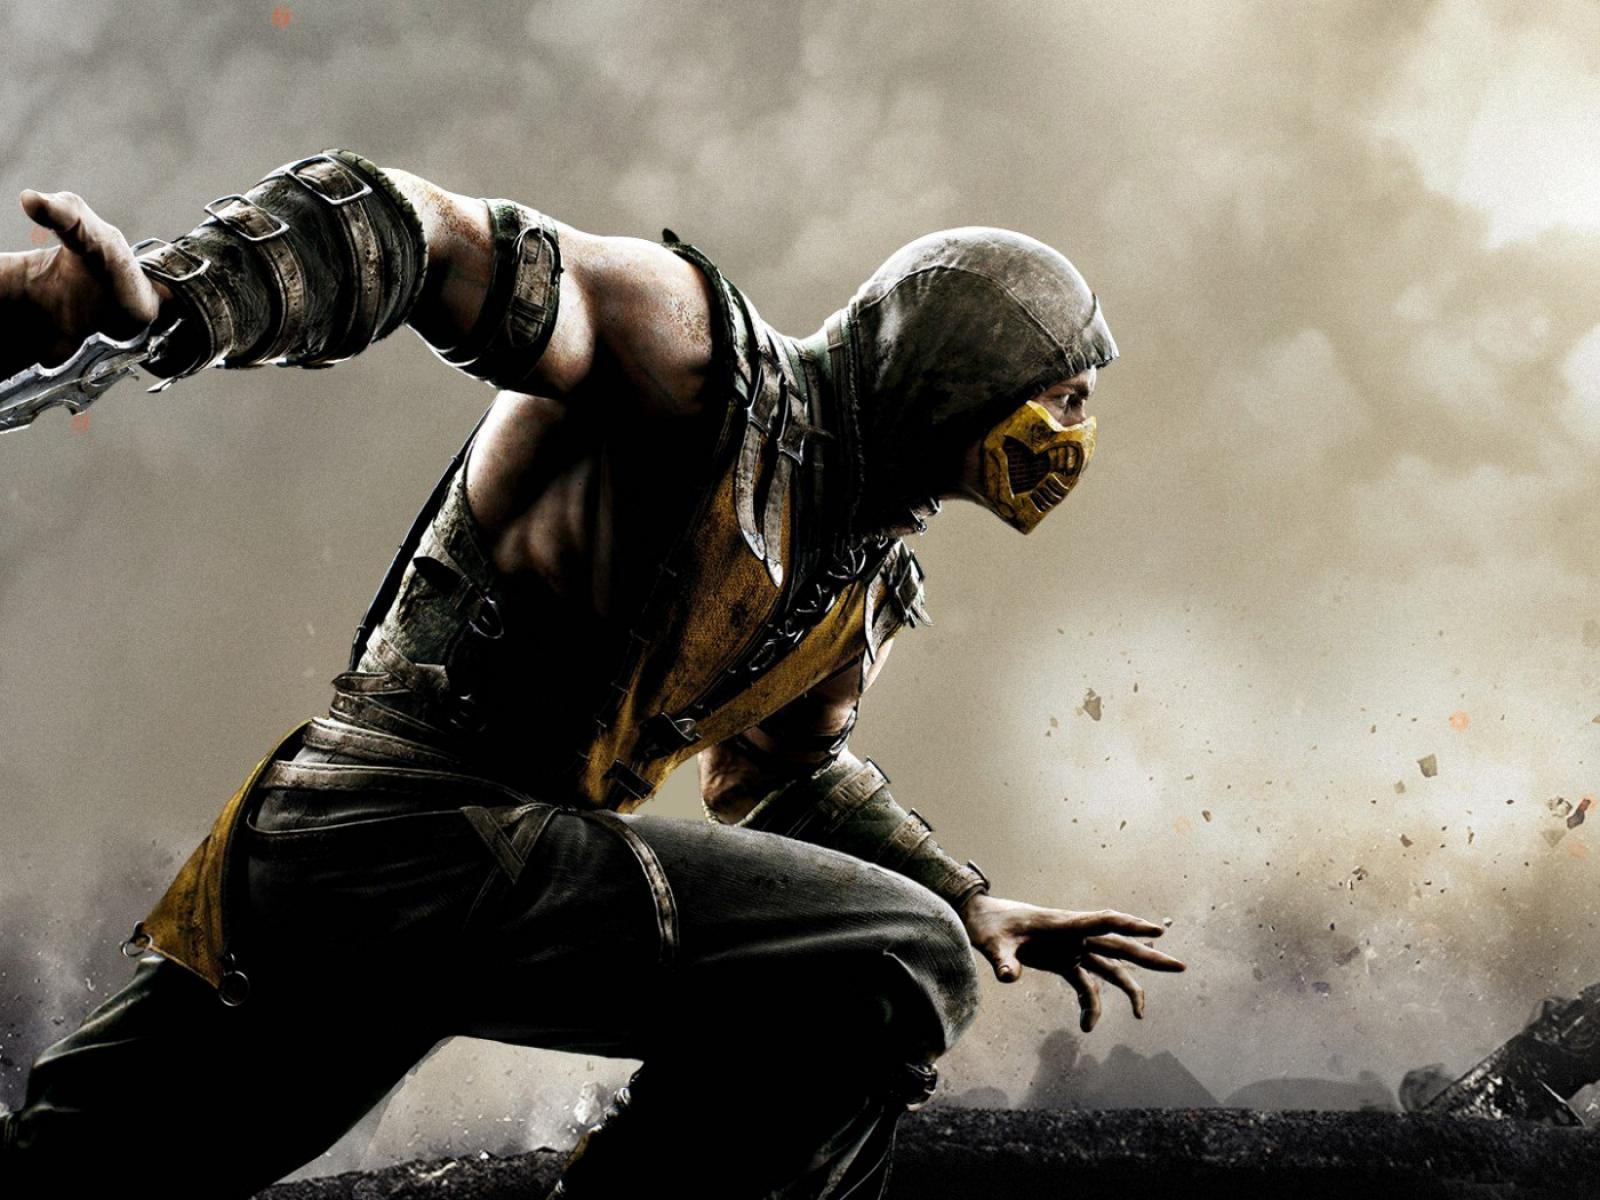 HD Background Mortal Kombat X Scorpion Wallpaper 1600x1200